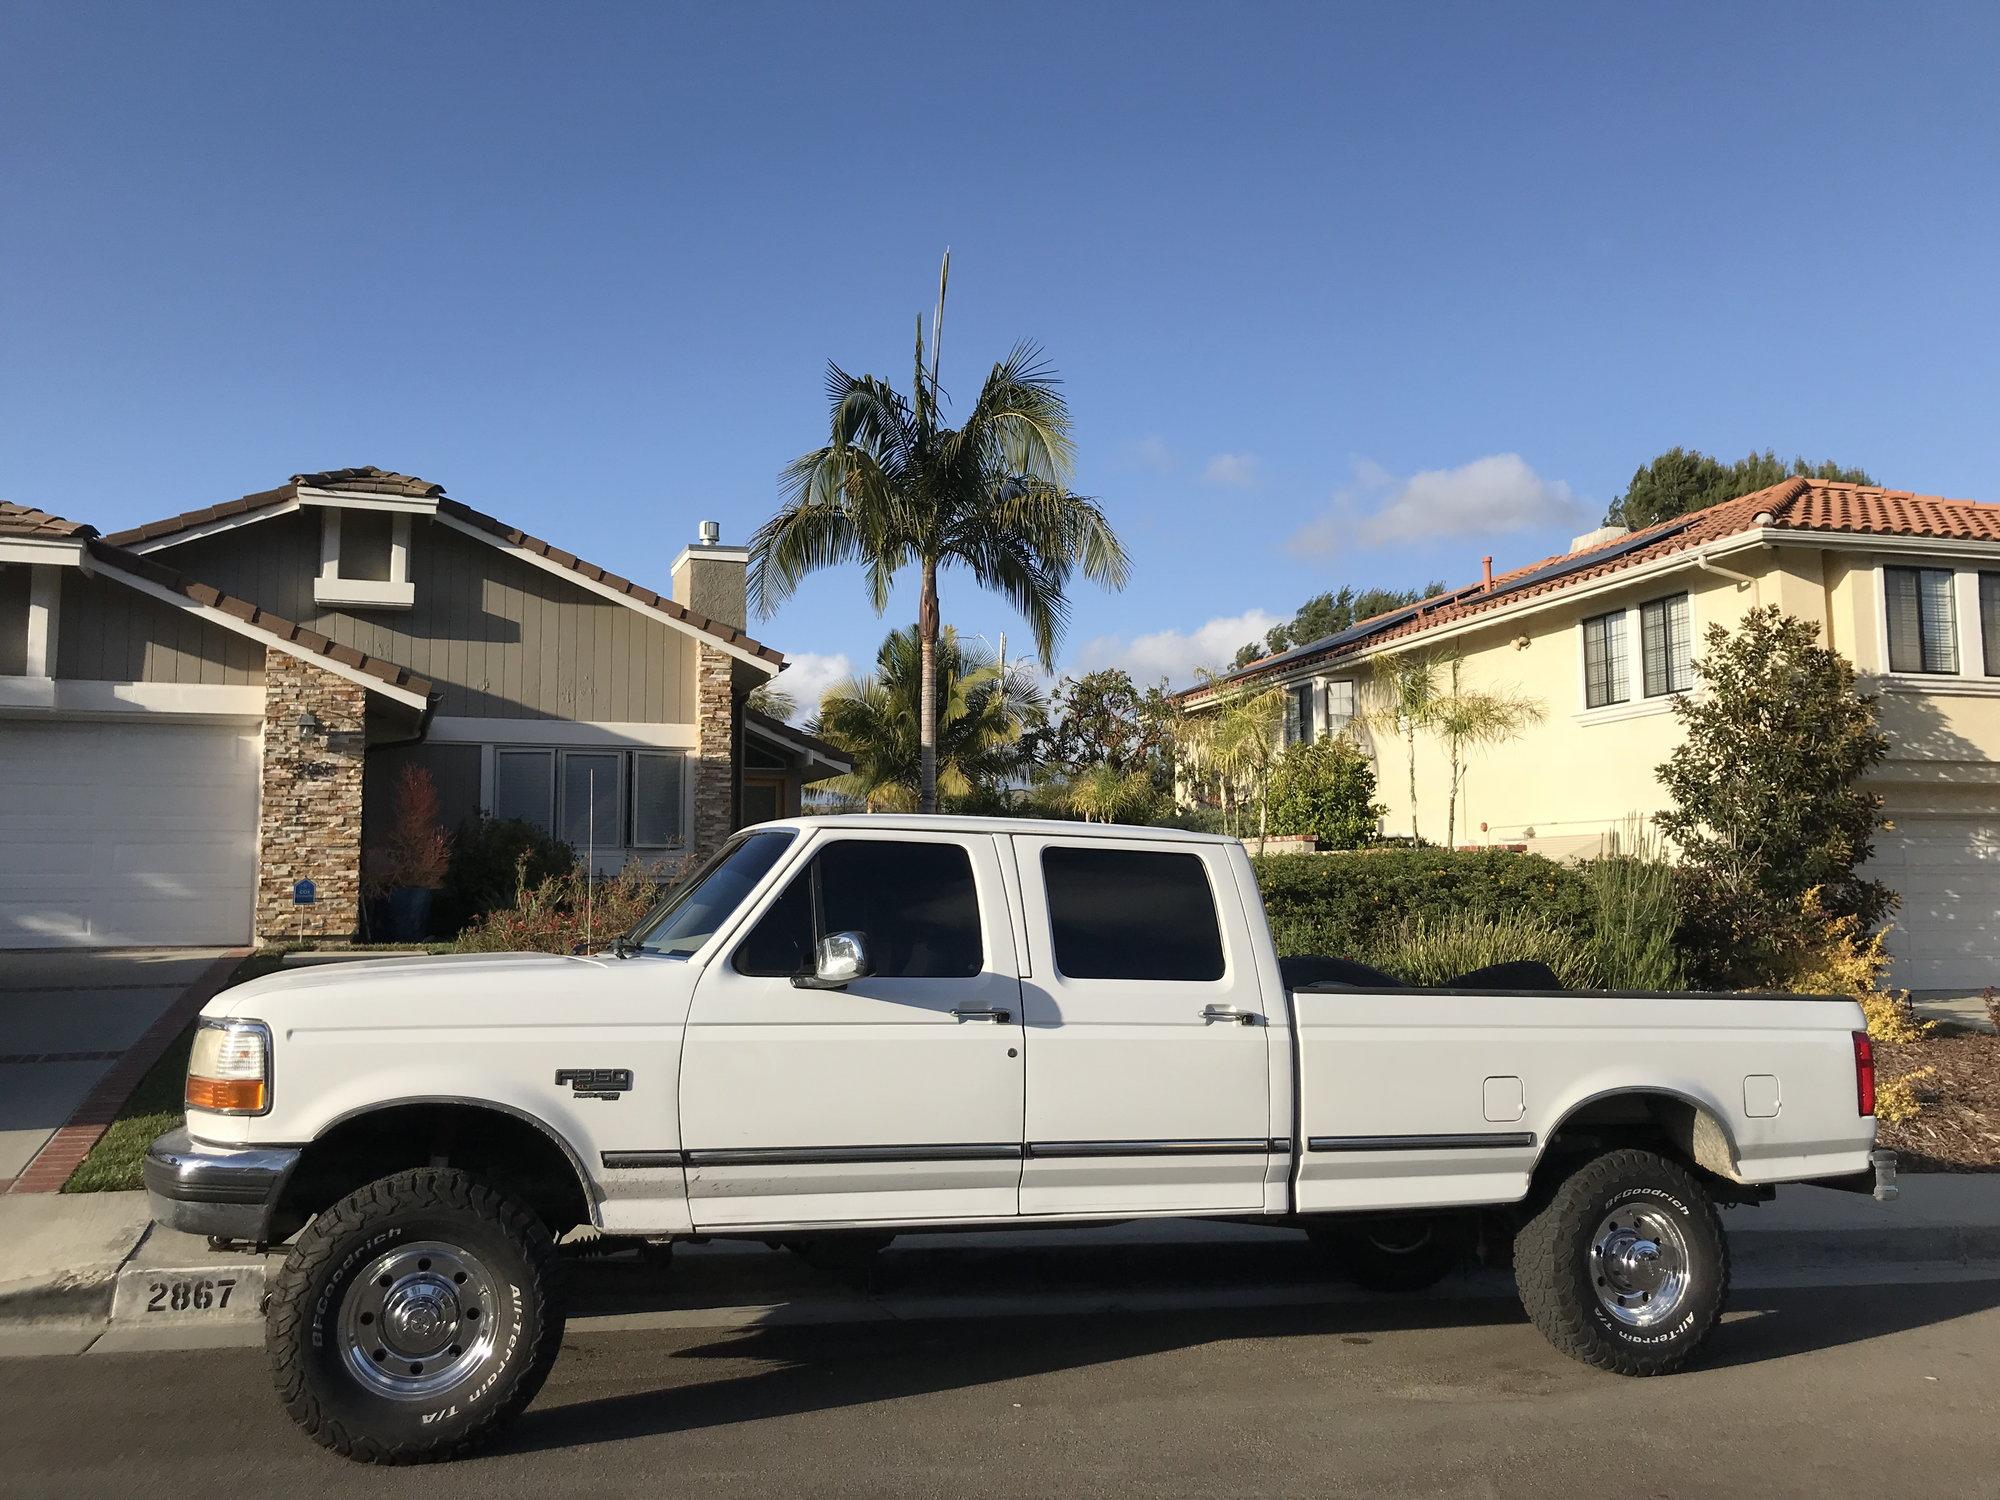 Budget Car Rental In El Cajon Ca